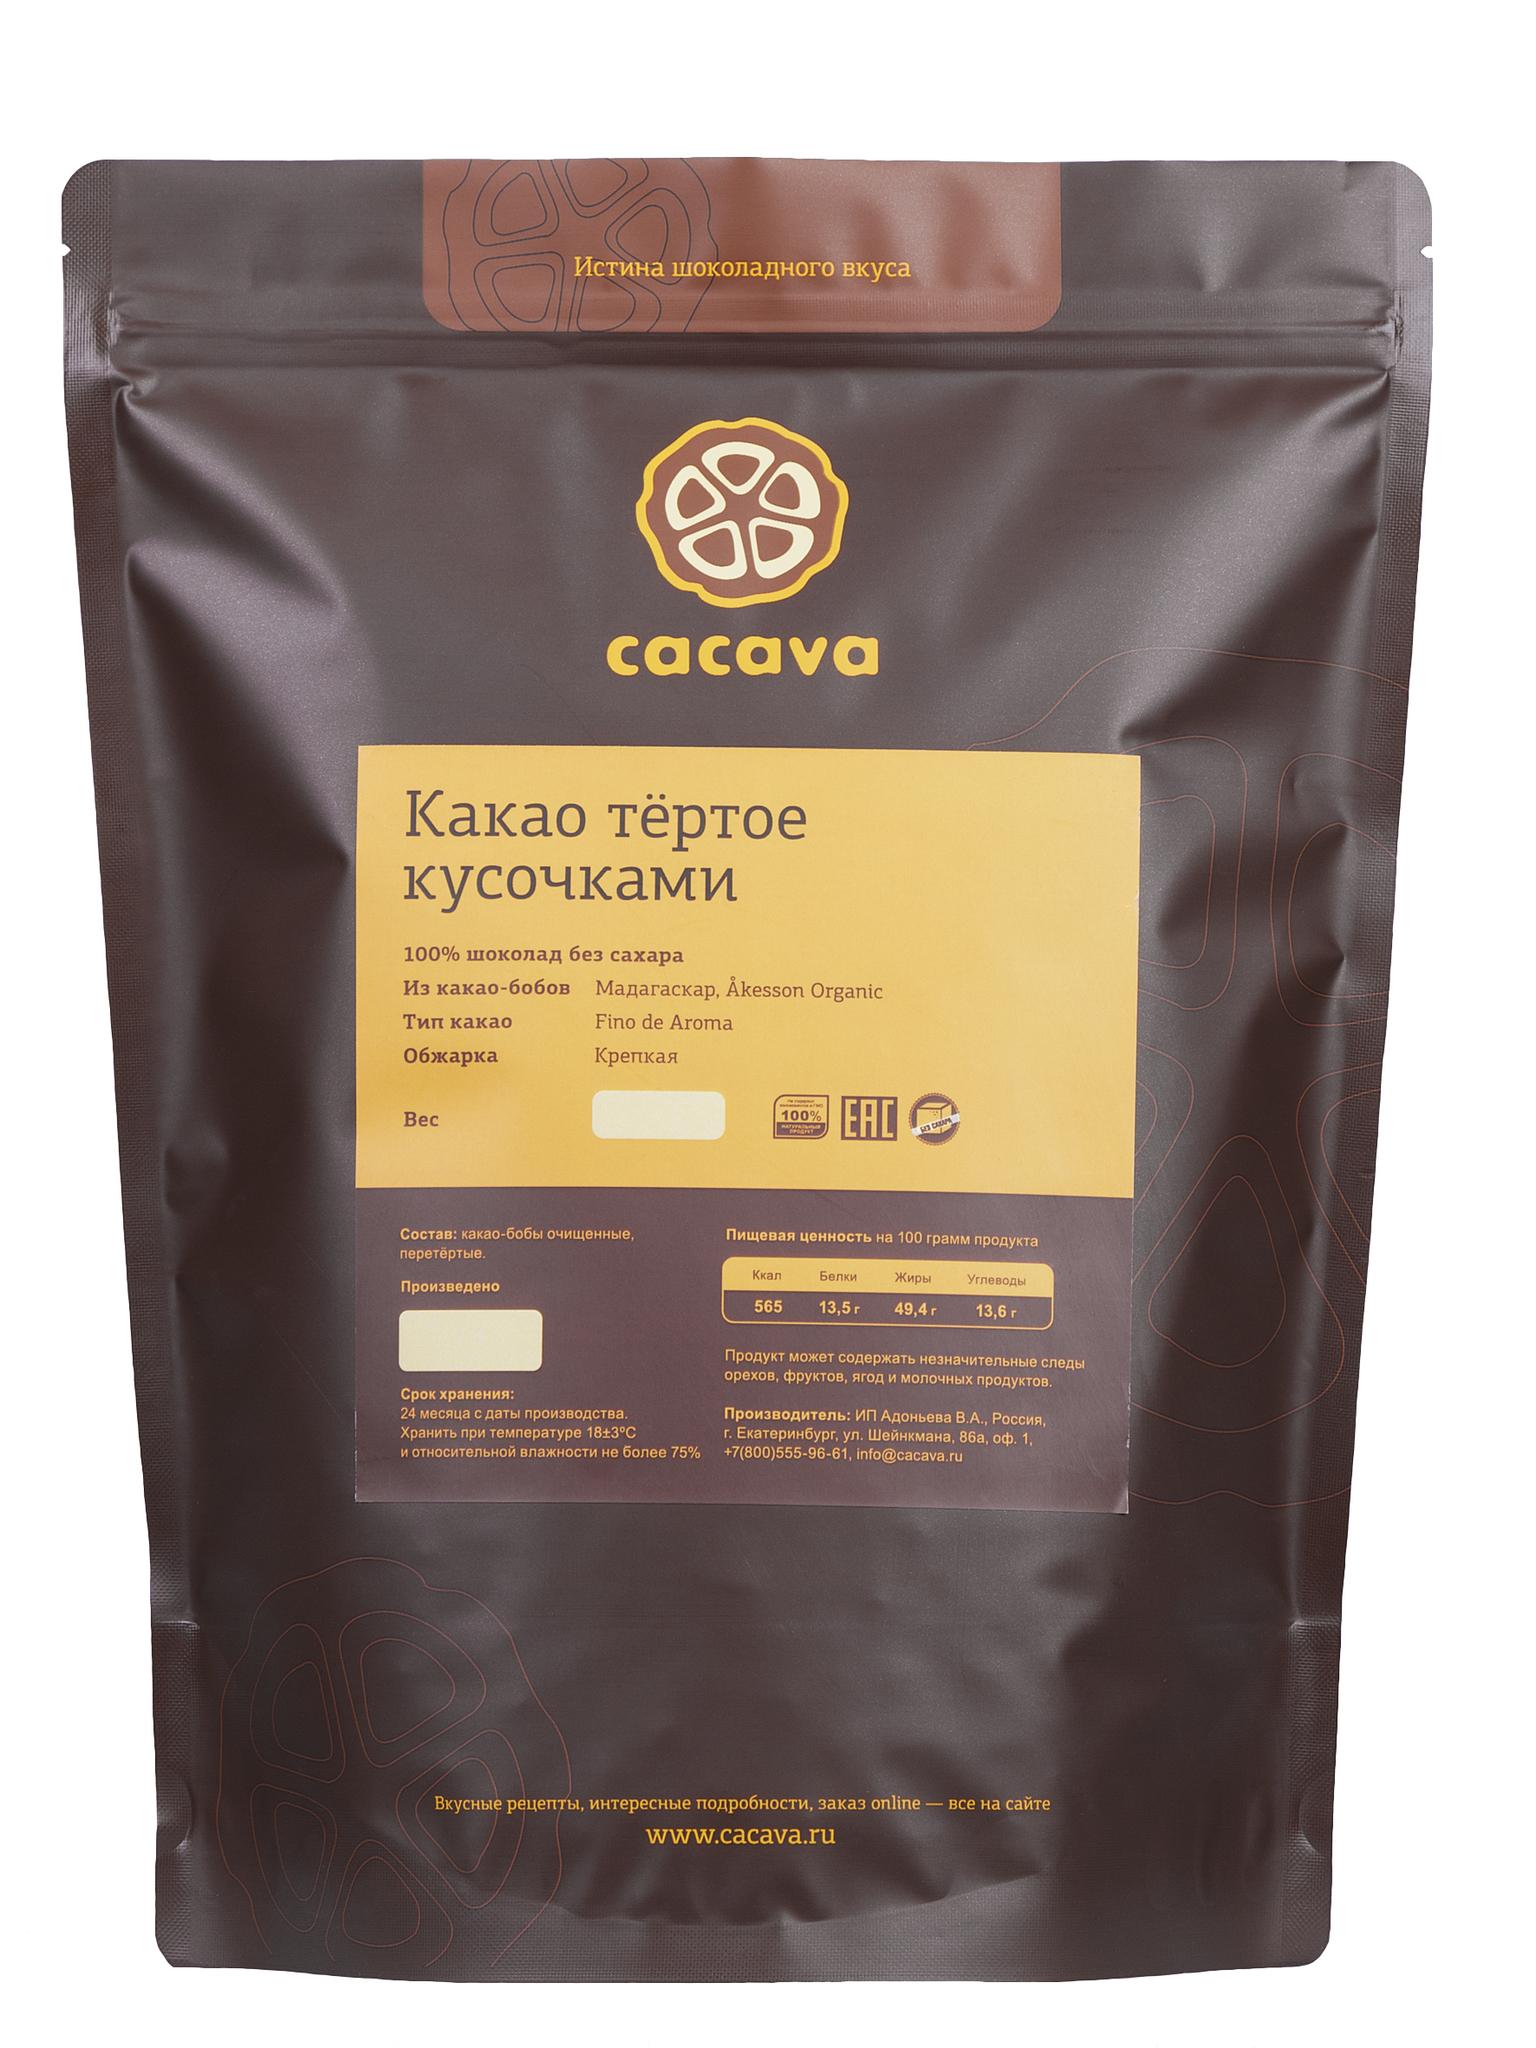 Какао тёртое кусочками (Мадагаскар, Åkesson), упаковка 1 кг